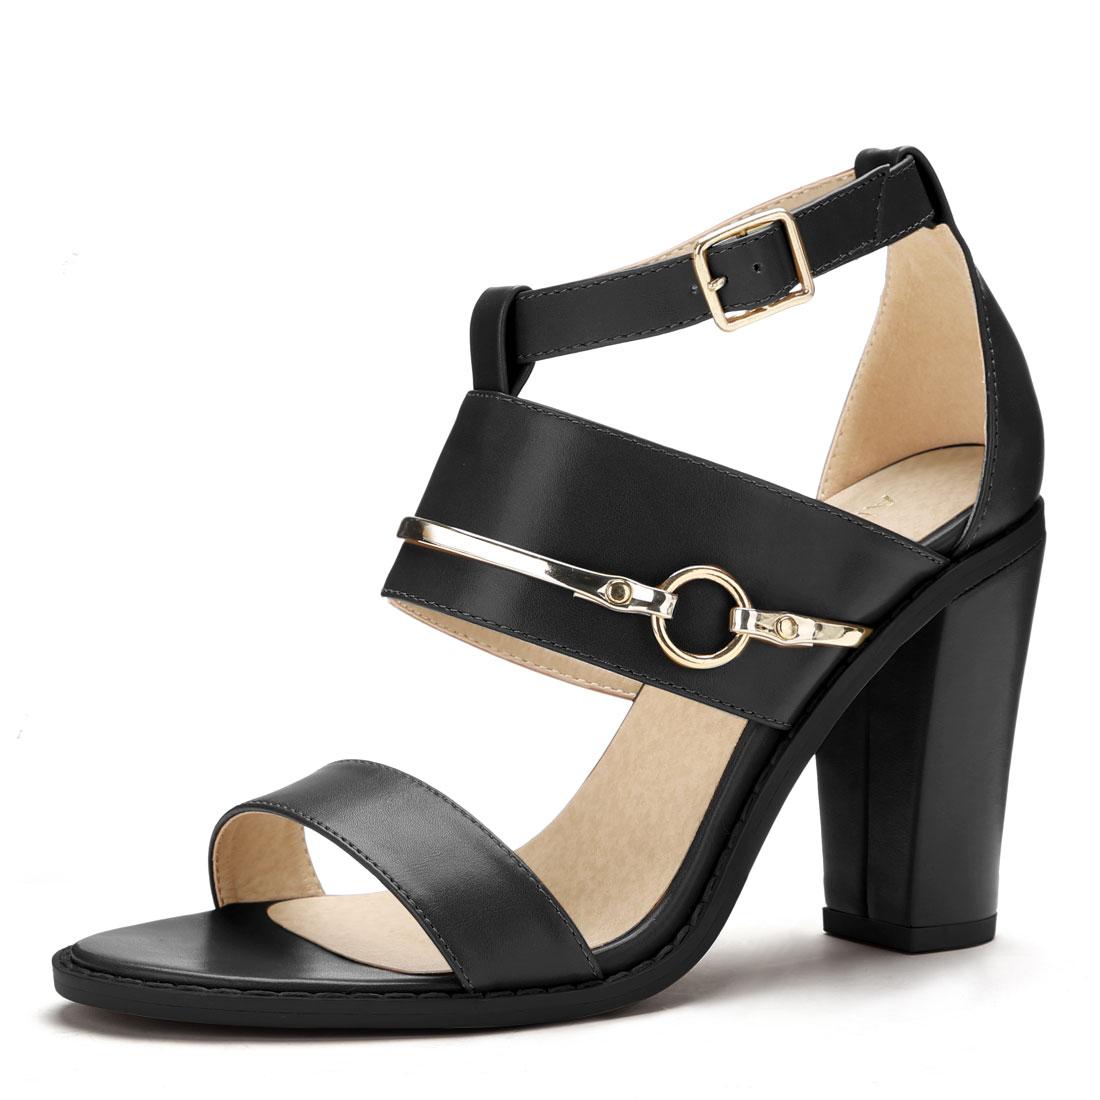 Women Open Toe Chunky High Heel Ankle Strap Sandals Black US 9